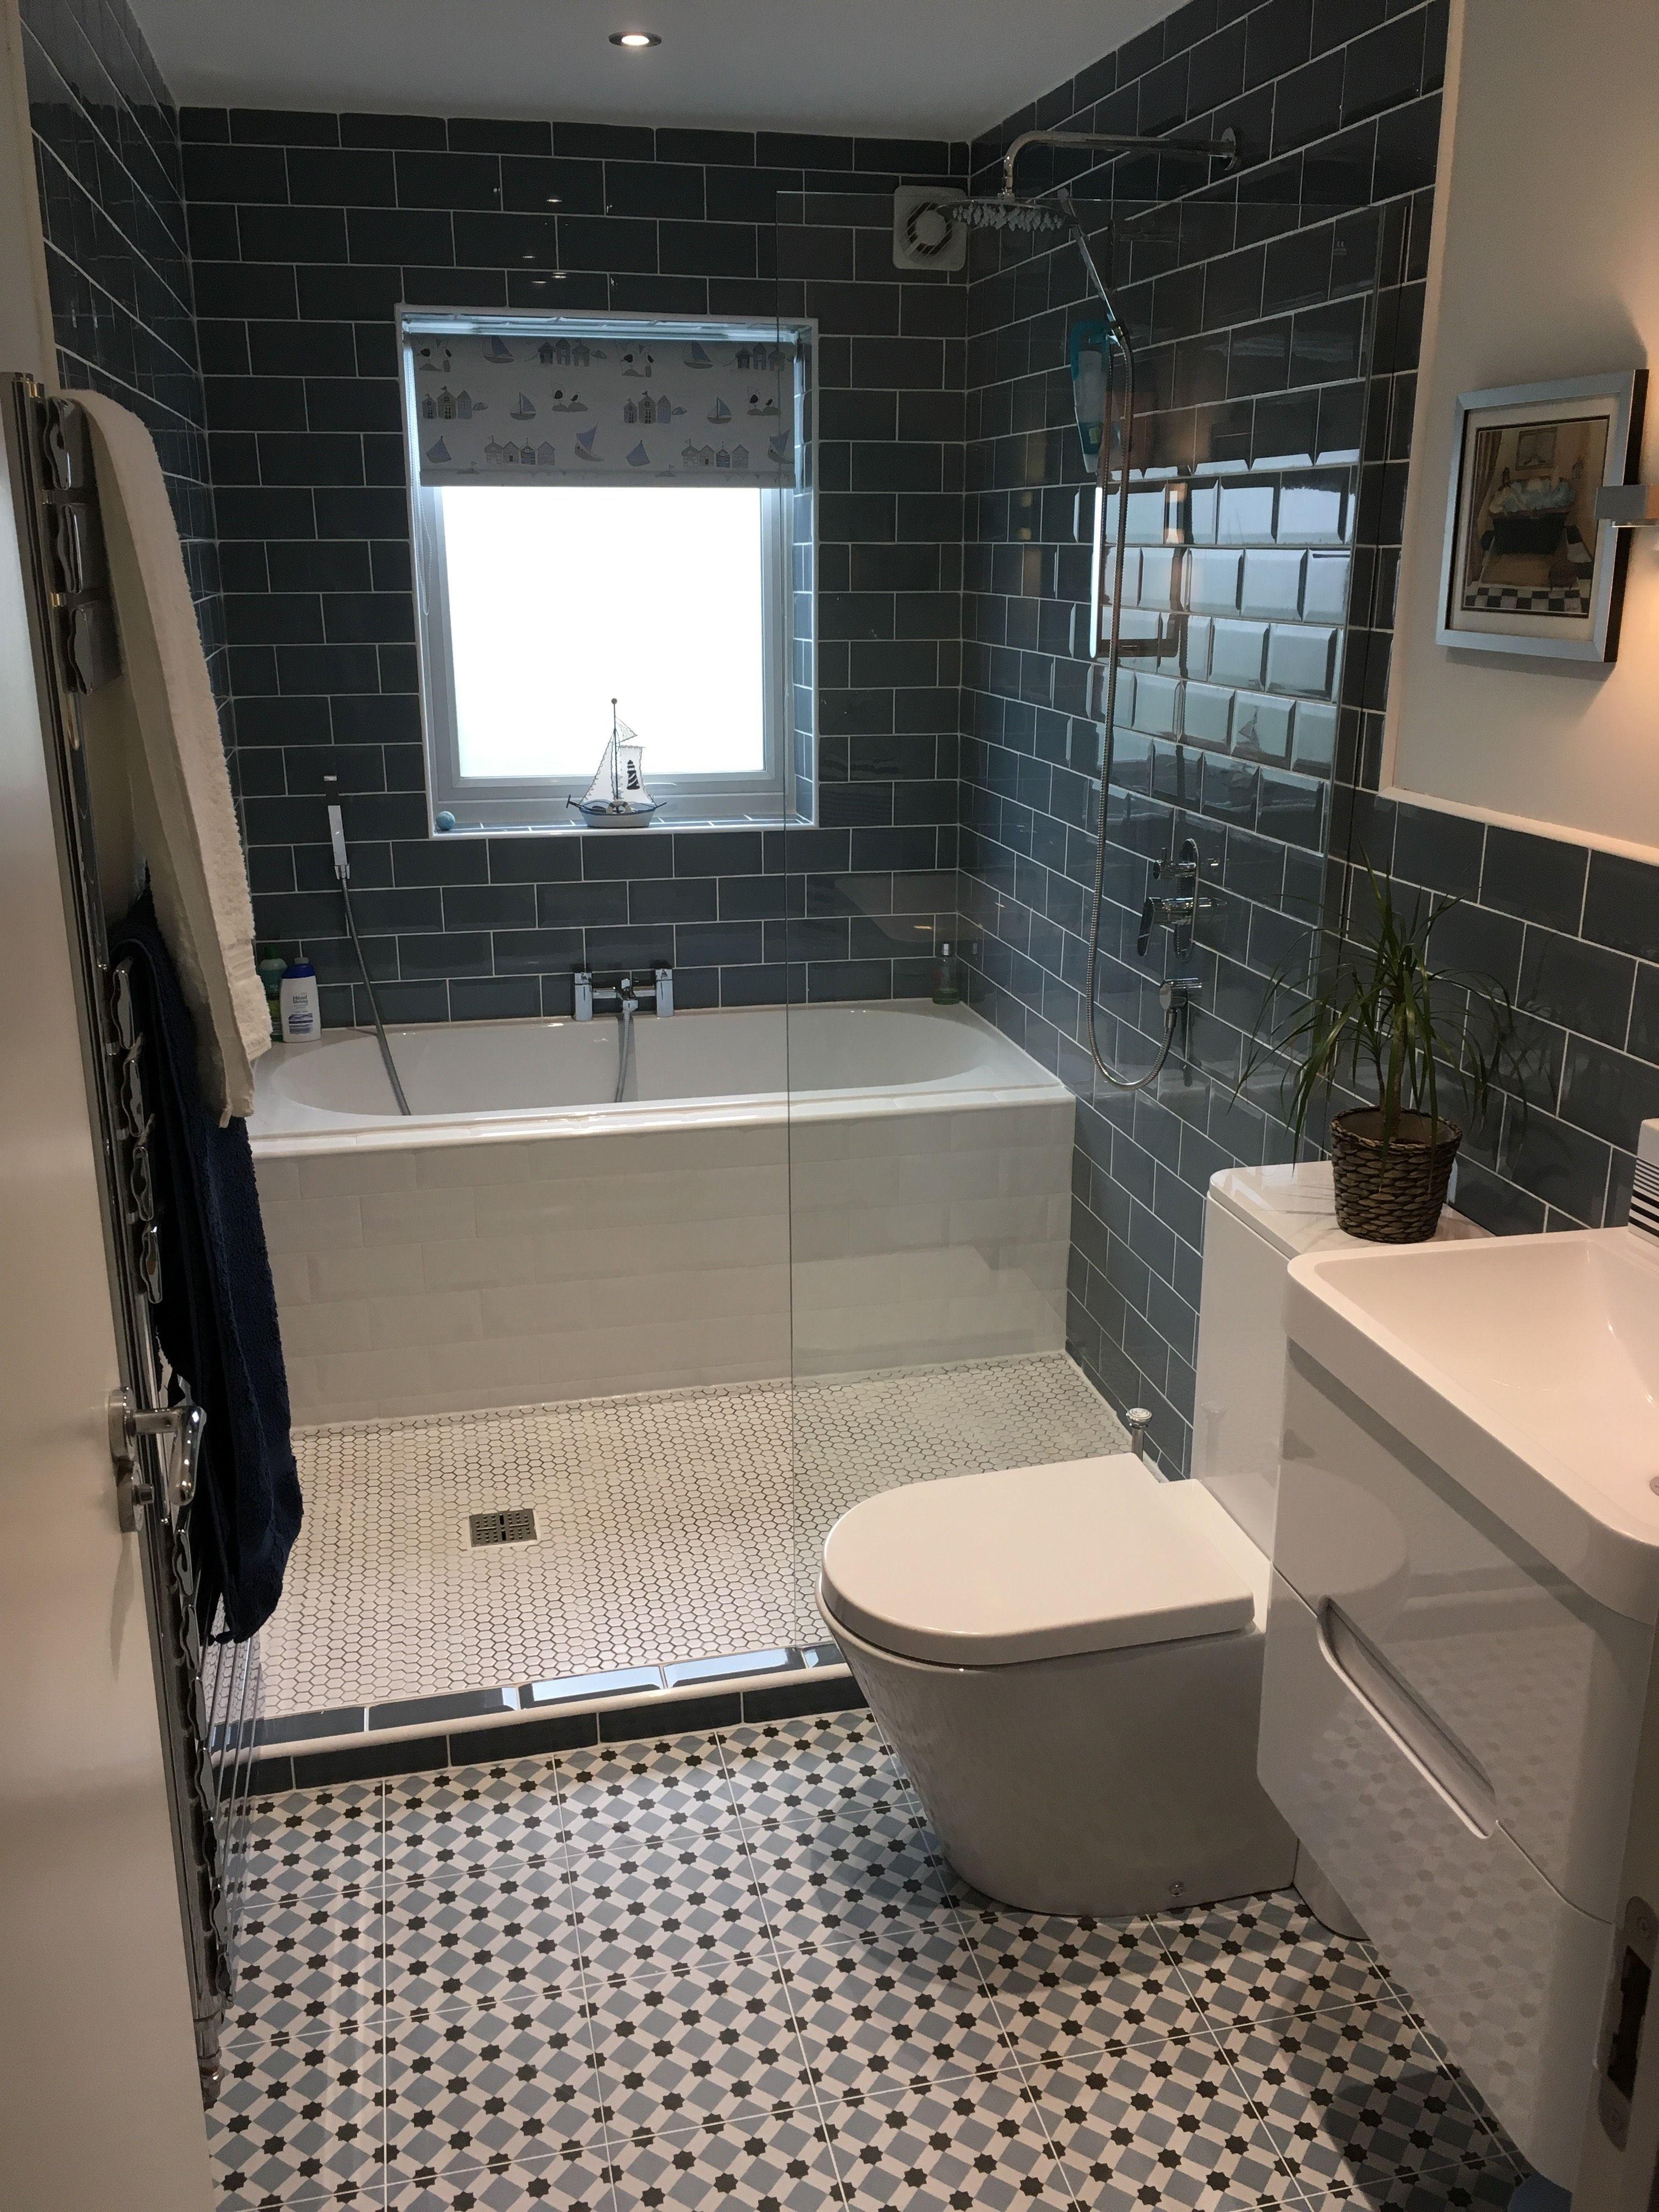 Tags Shower Room Shower Room Ideas Shower Room Design Shower Room Tiles Shower Room Suite Small Bathroom Remodel Small Bathroom Remodel Designs Small Bathroom